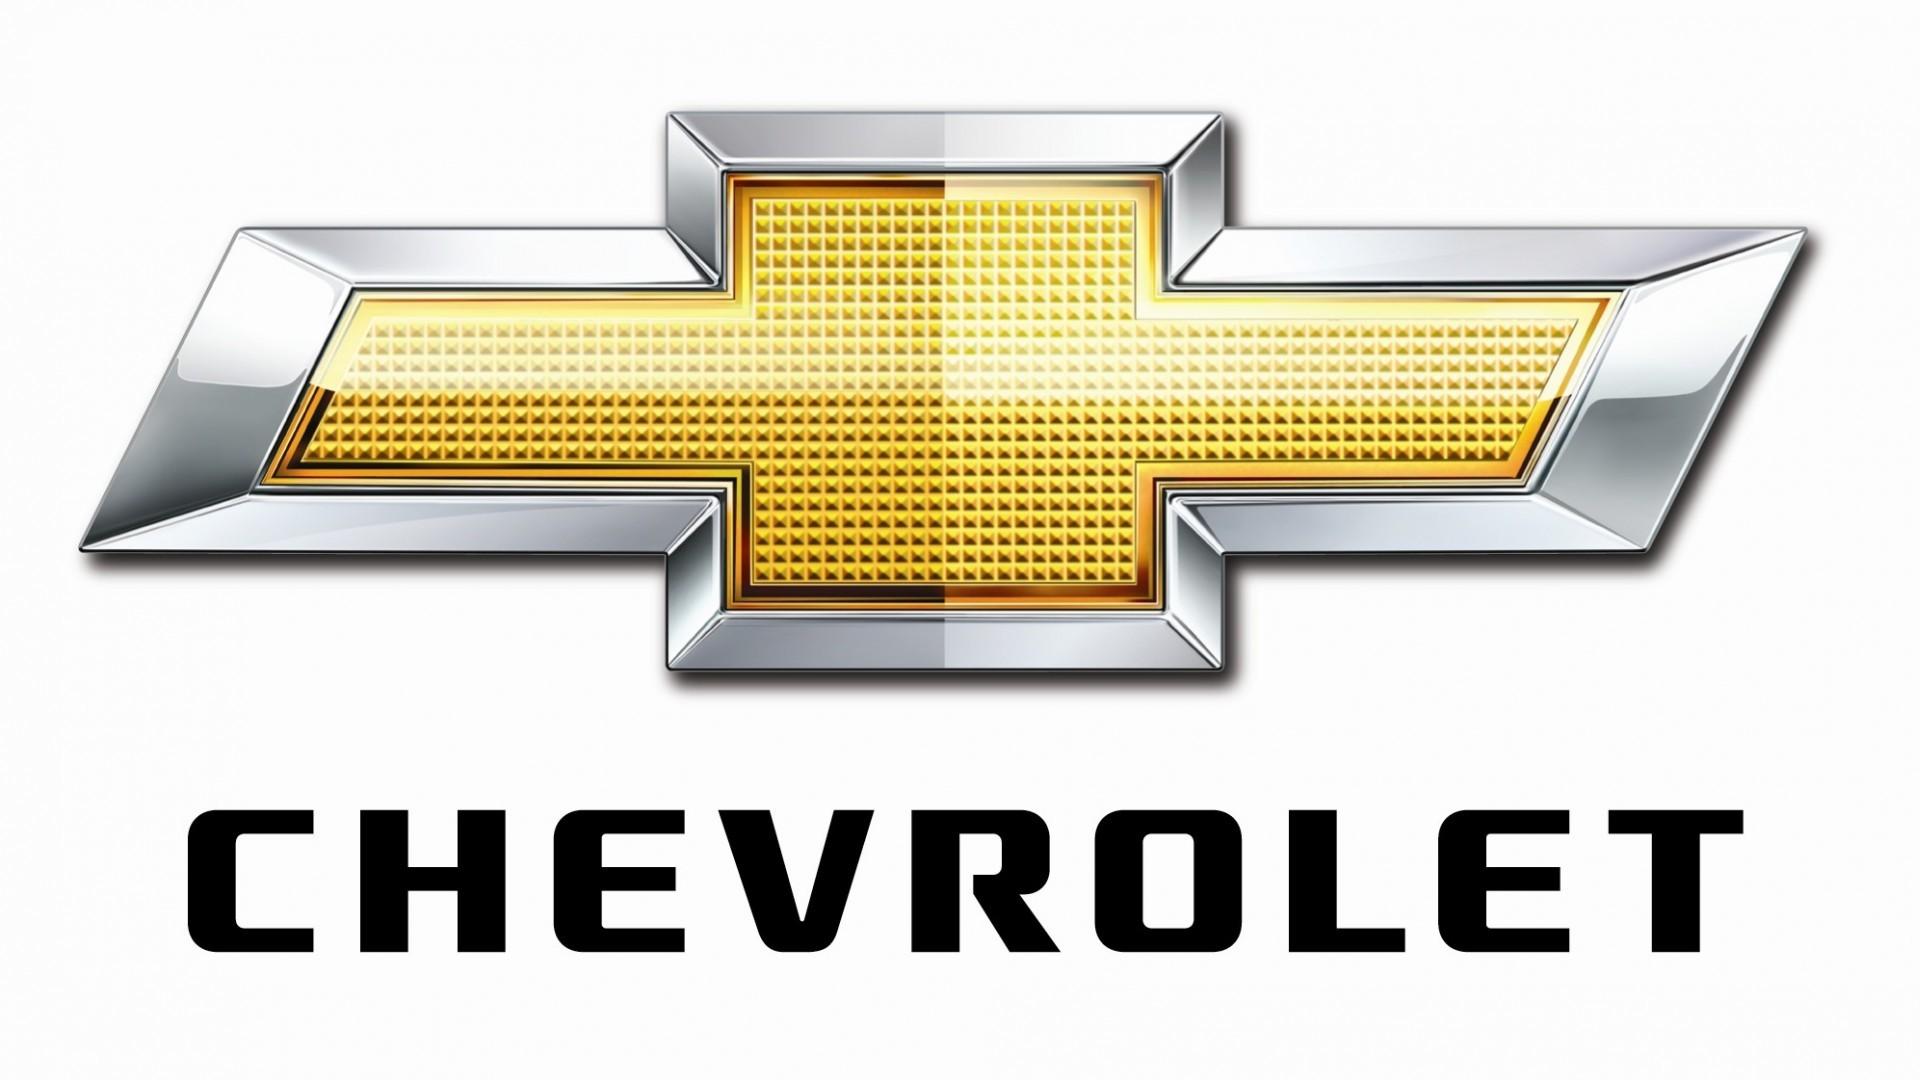 Image for Chevrolet Logo Vector 2015 Car Wallpaper HD